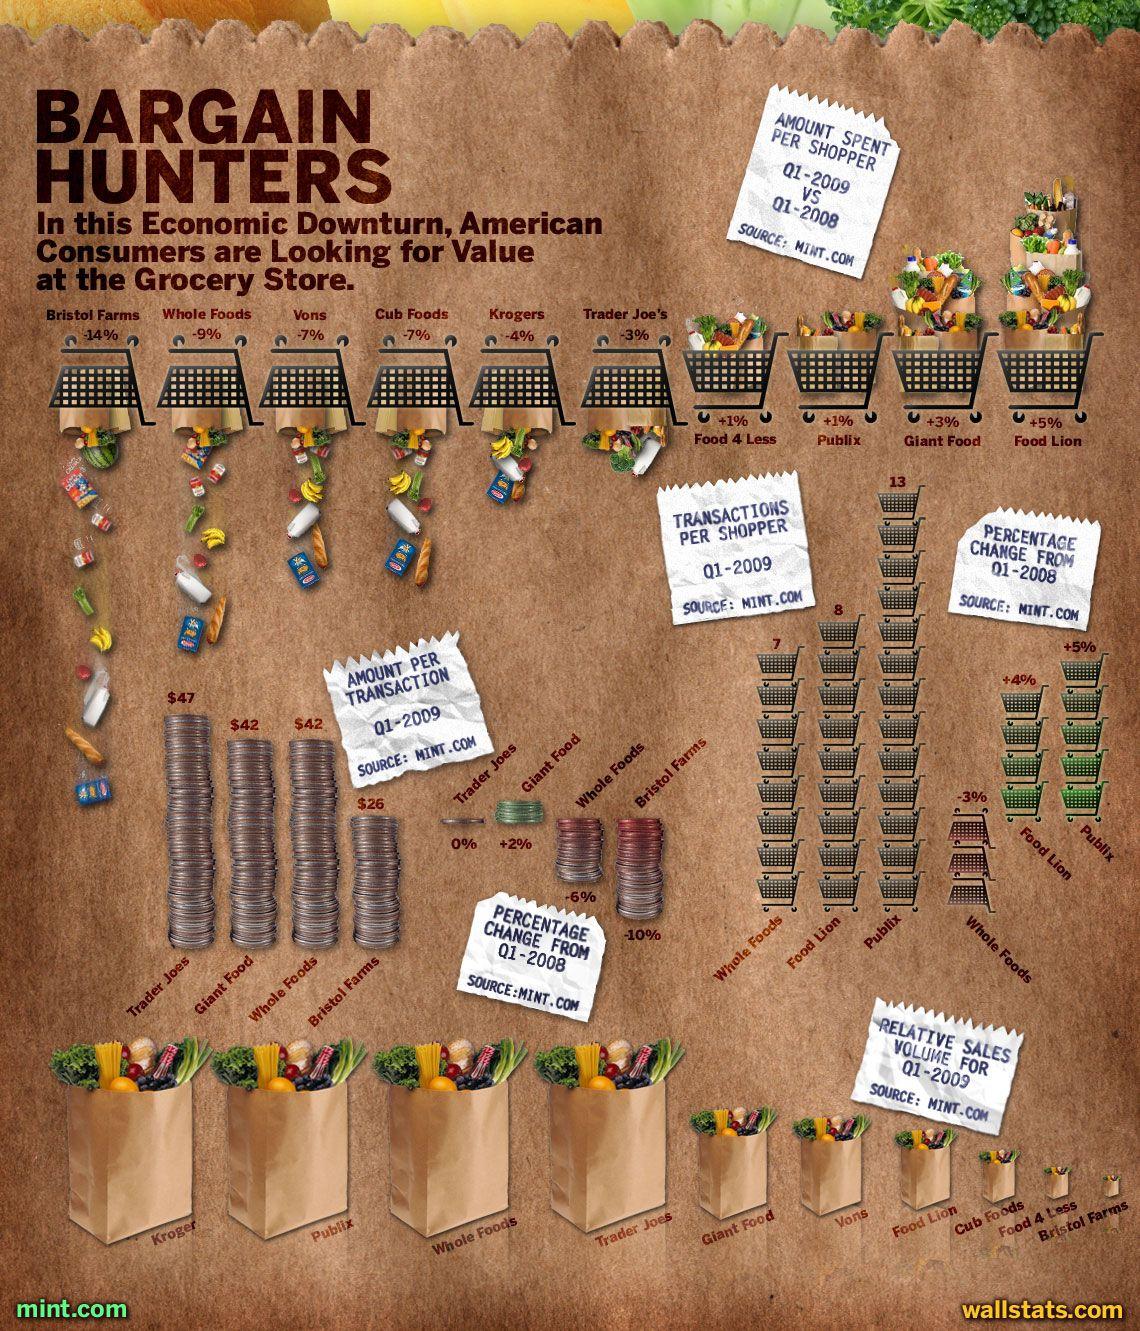 Bargain hunters giant food whole food recipes food lion